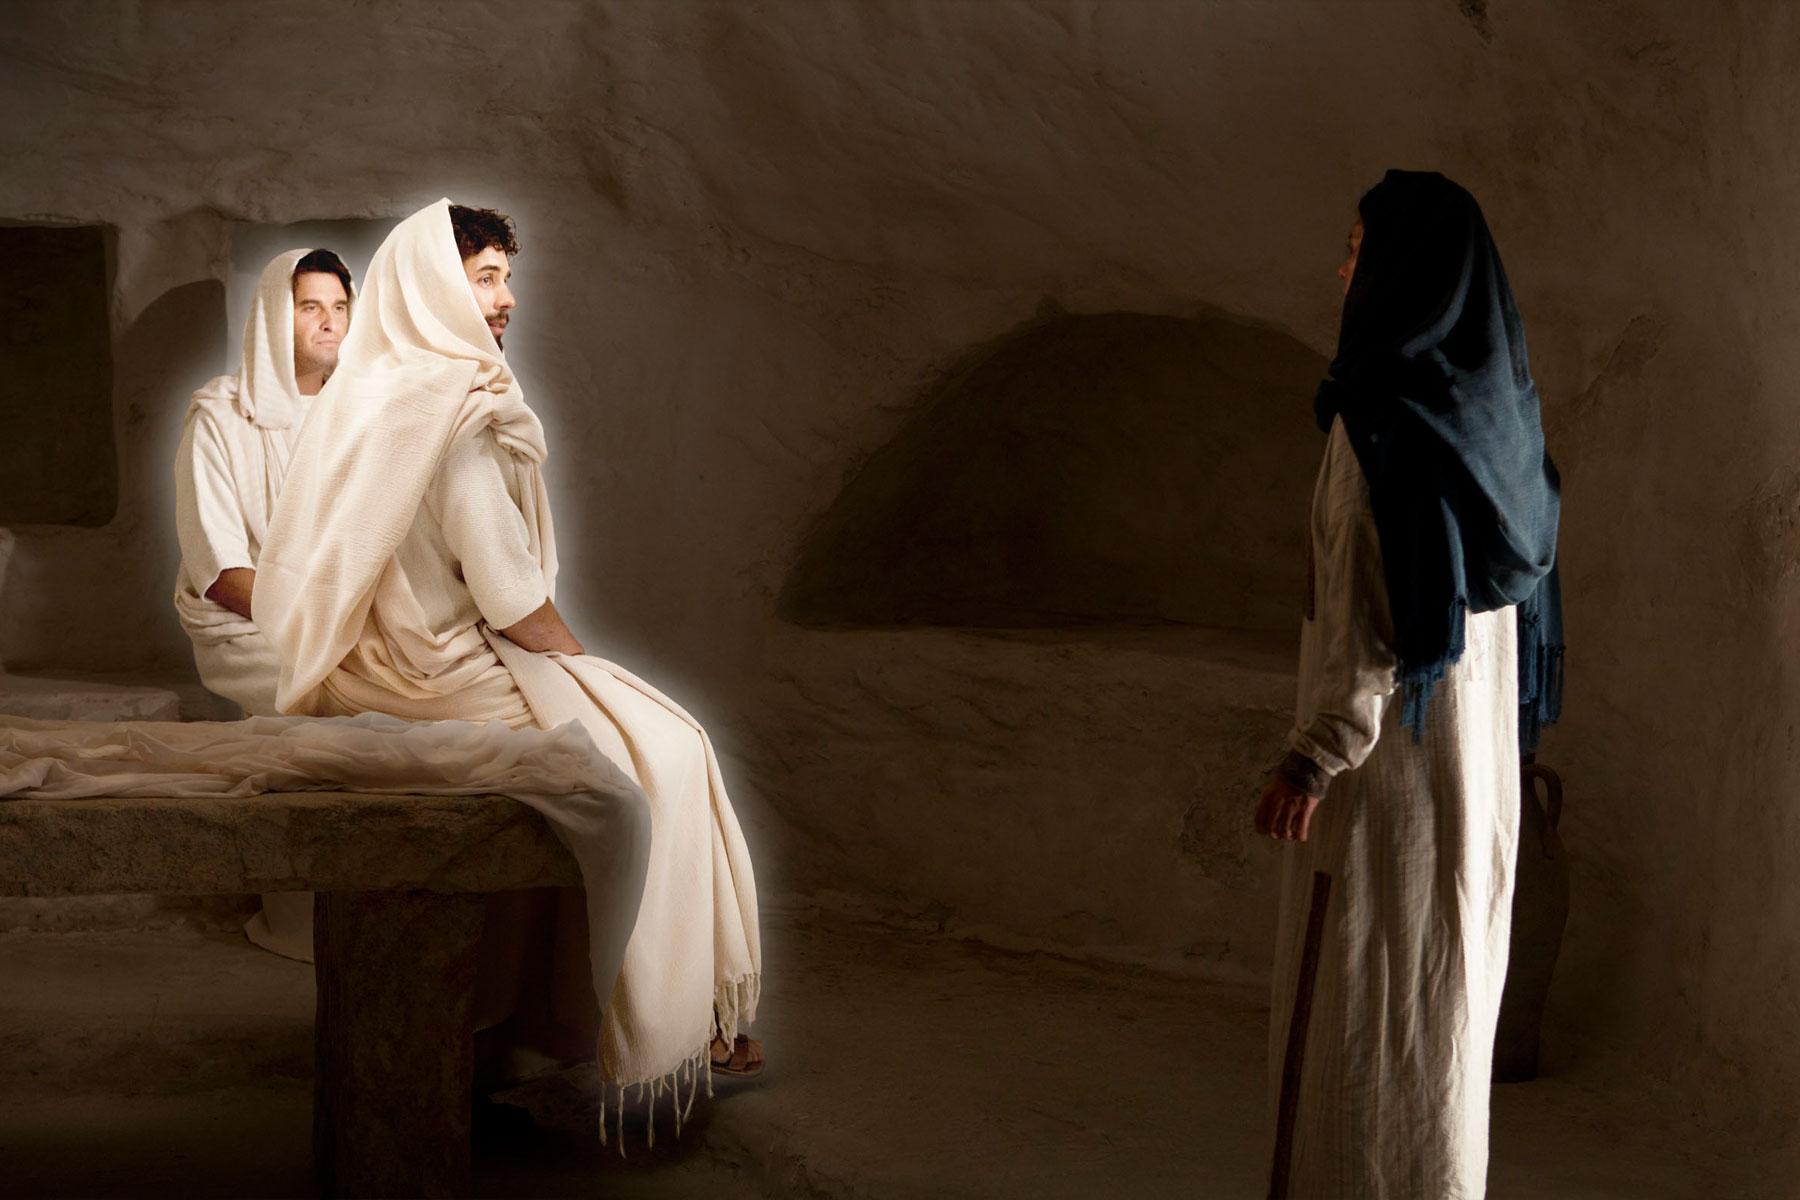 jesus is laid in a tomb jesus is laid in a tomb